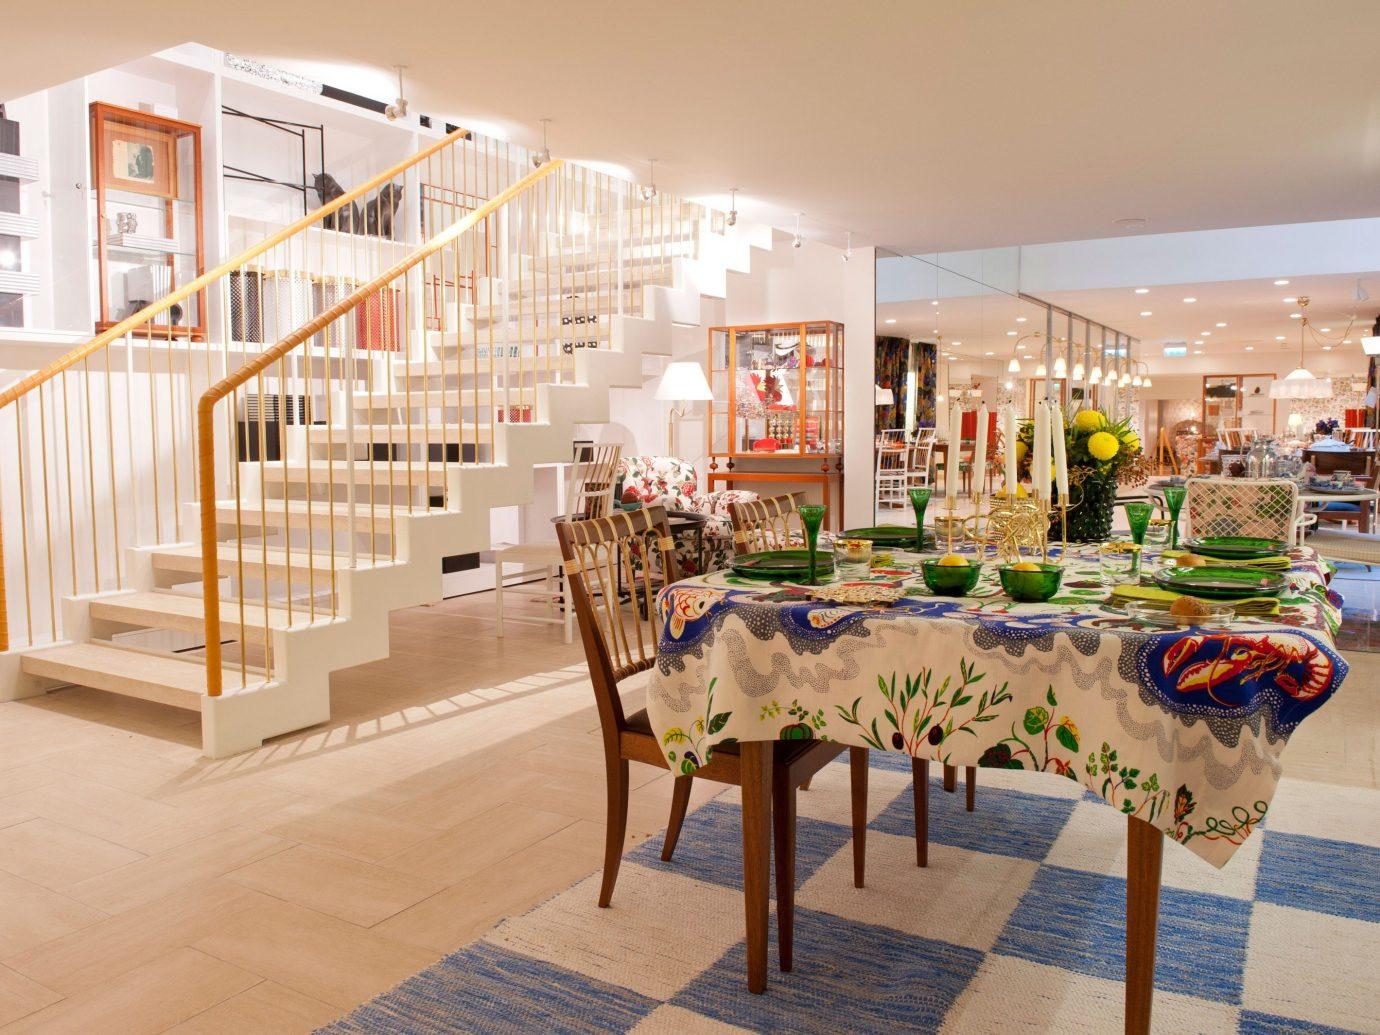 Style + Design floor indoor ceiling room retail scene interior design art shopping mall Design Lobby furniture